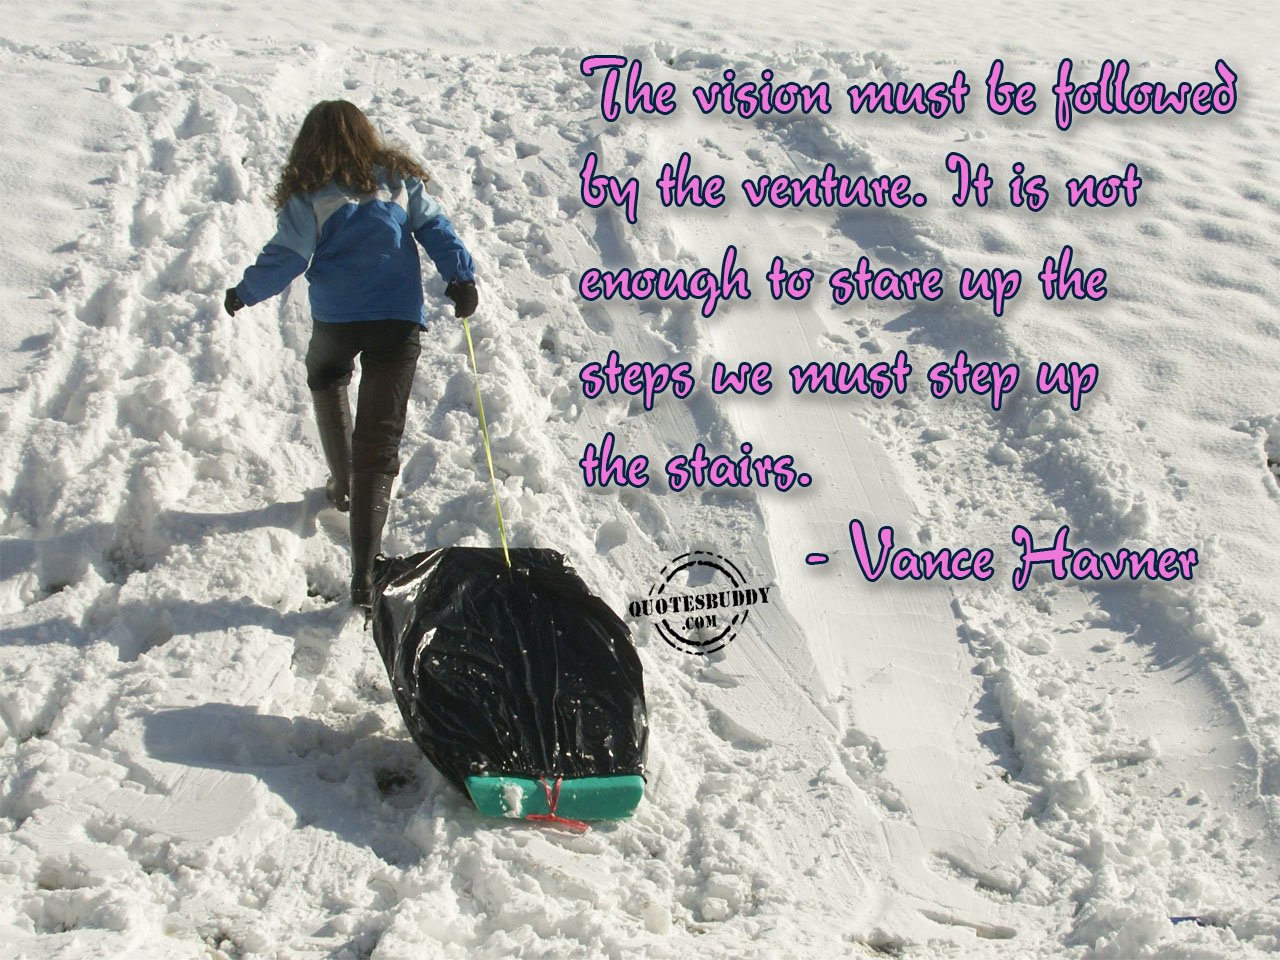 Vision quote #4